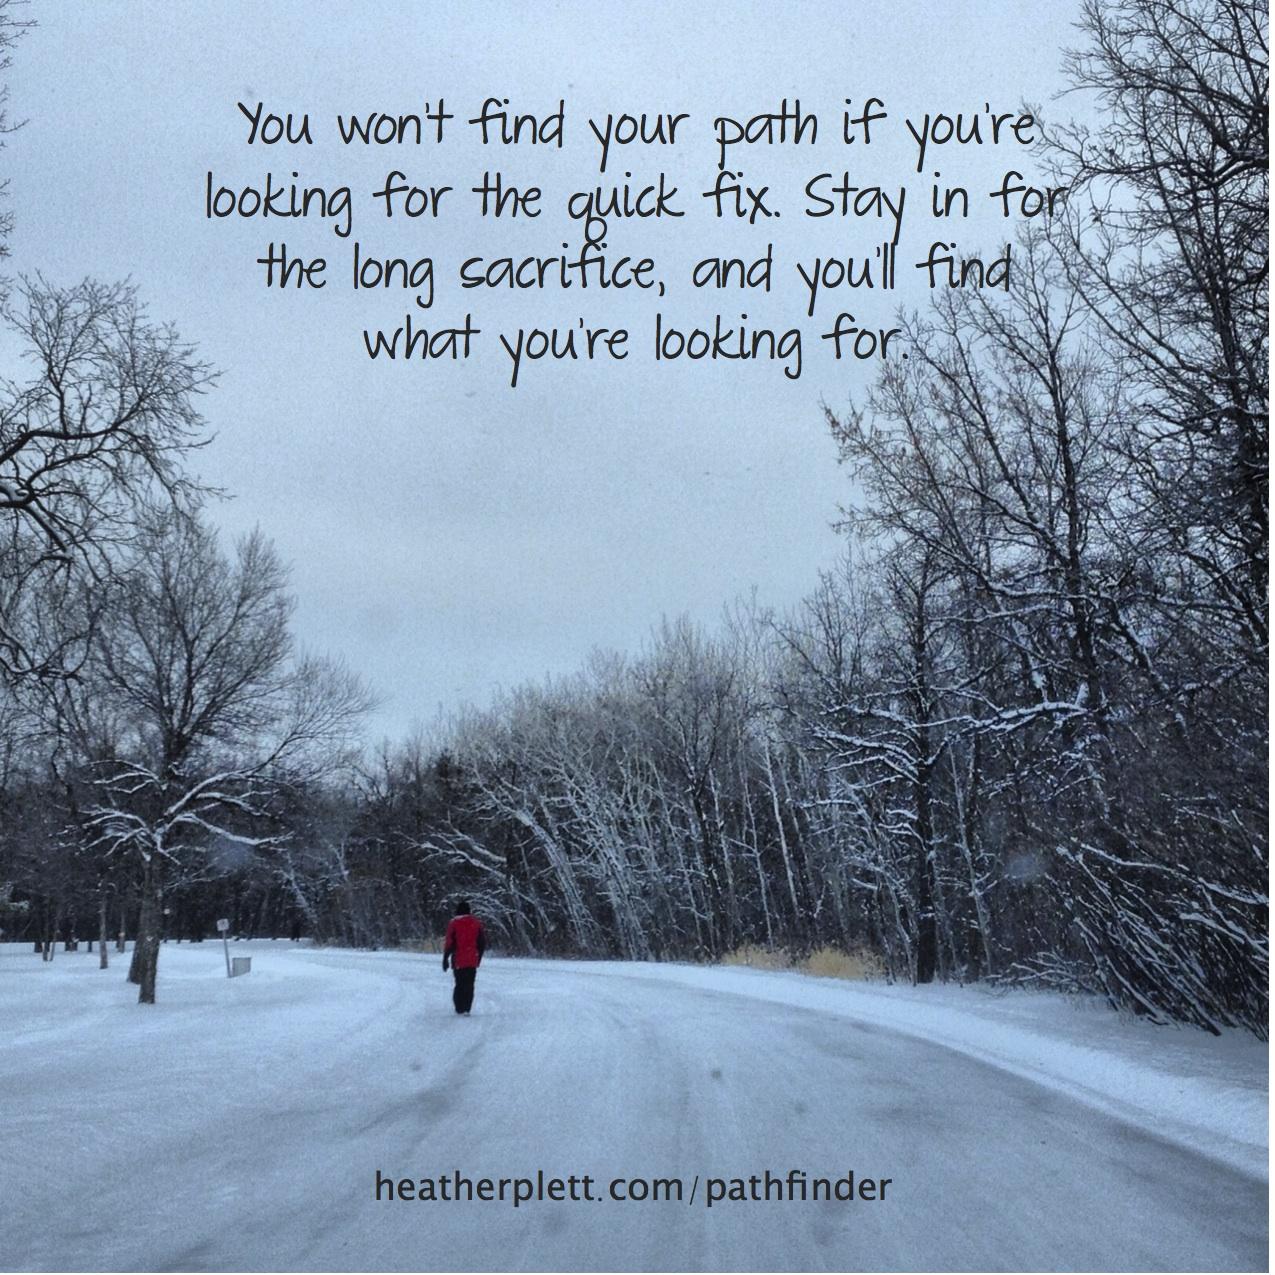 Is the sacrifice worth it? - Heather Plett